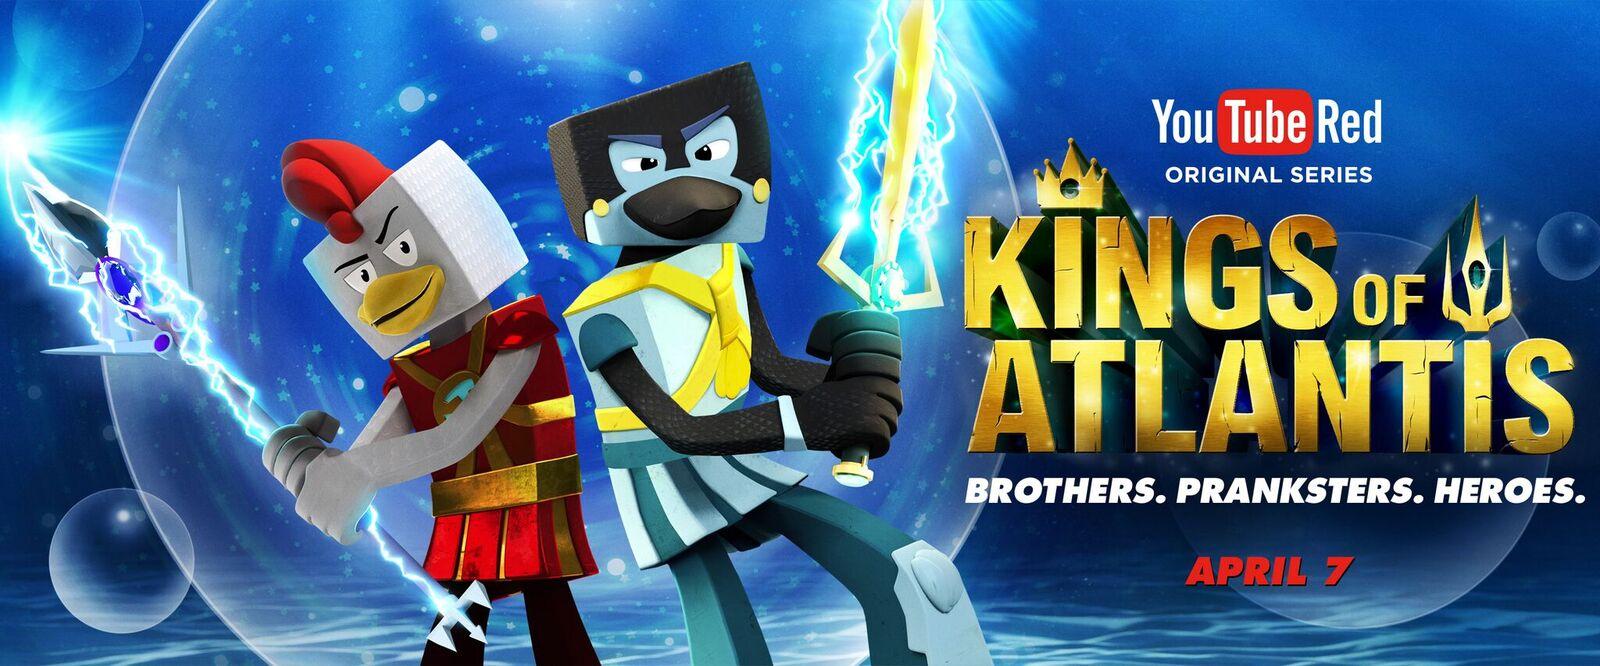 New YouTube Red Original Series  Kings of Atlantis .